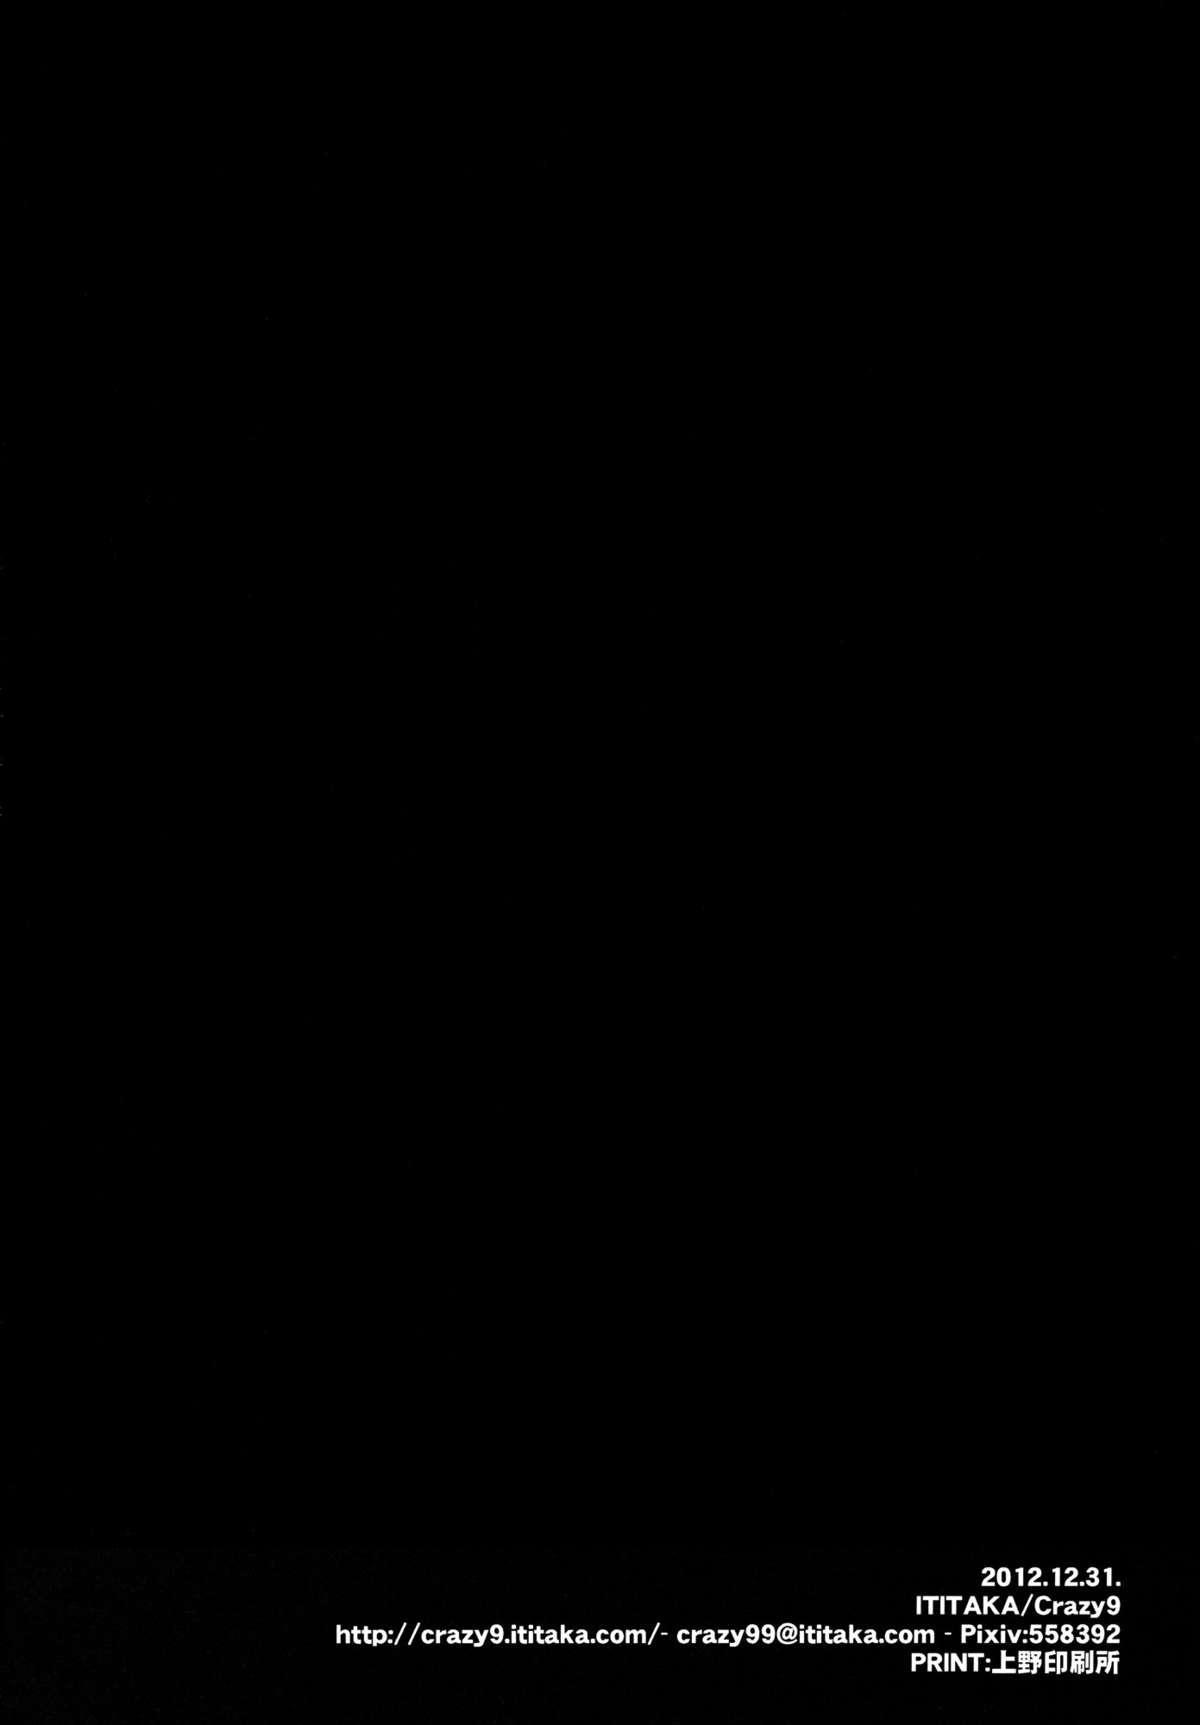 (C83) [Crazy9 (Ichitaka)] C9-03 Suguha to Lyfa to Oniichan no Shiawase Kazoku Keikaku   Plan For a Happy Family-Life with Suguha, Leafa, and Onii-chan (Sword Art Online) [English] {doujin-moe.us} 27